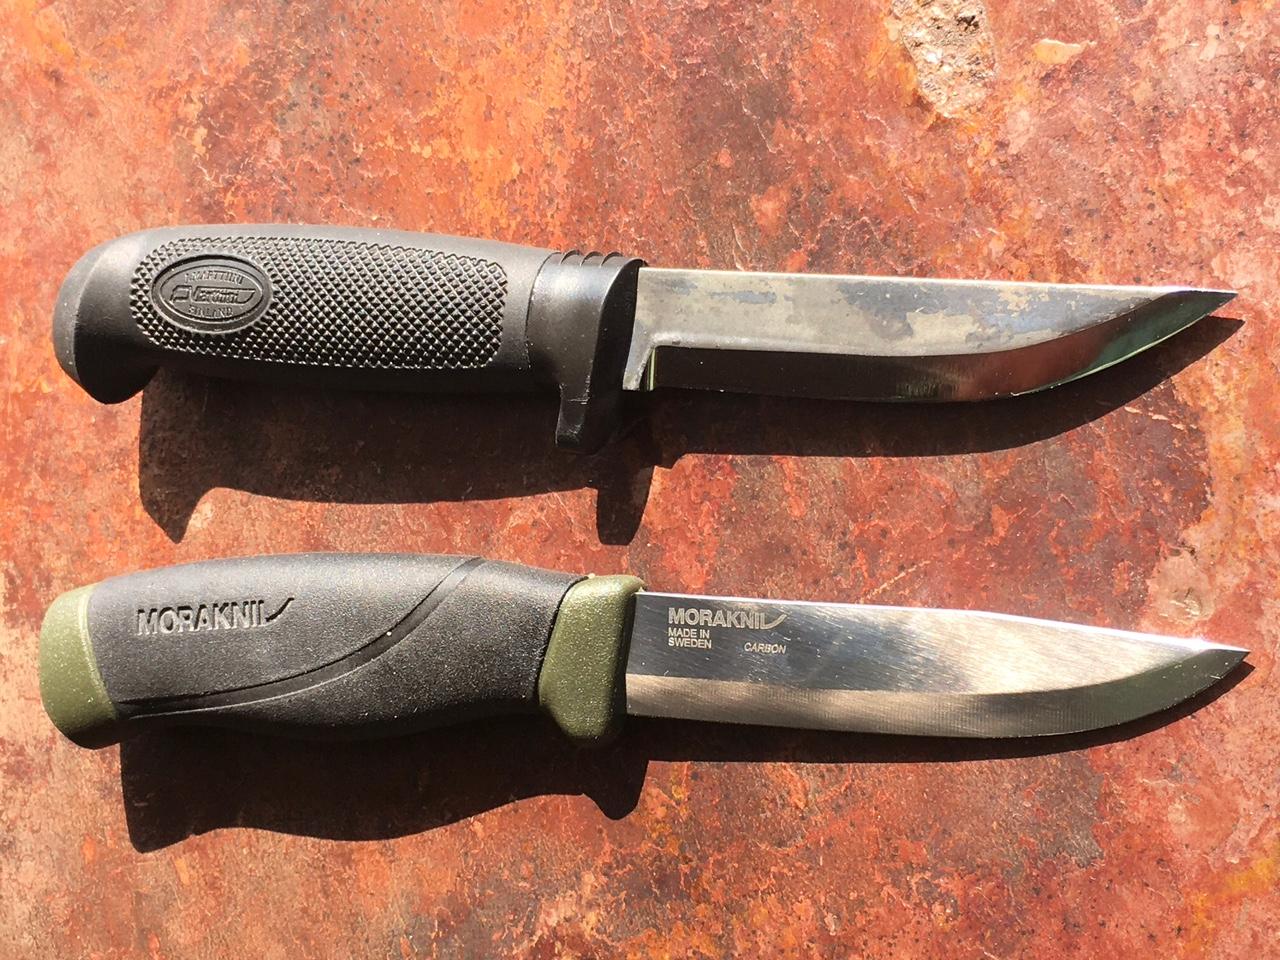 Martiini and Mora knives.jpg